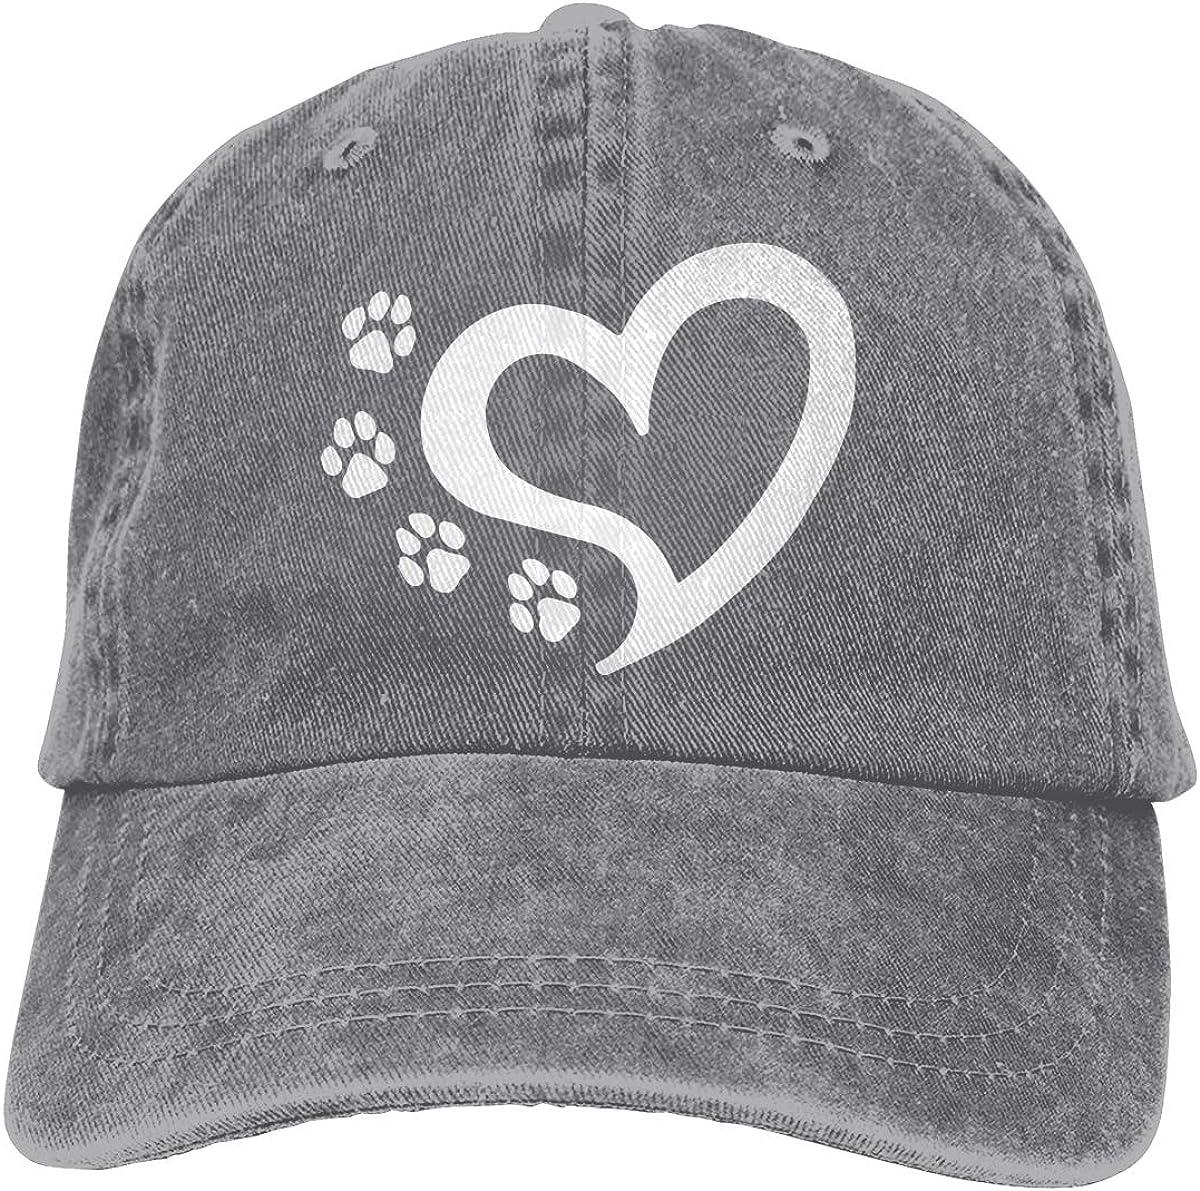 Men&Women Cat Dog Paw Prints Heart-1 Vintage Jeans Baseball Cap Adjustable Snapback Cap